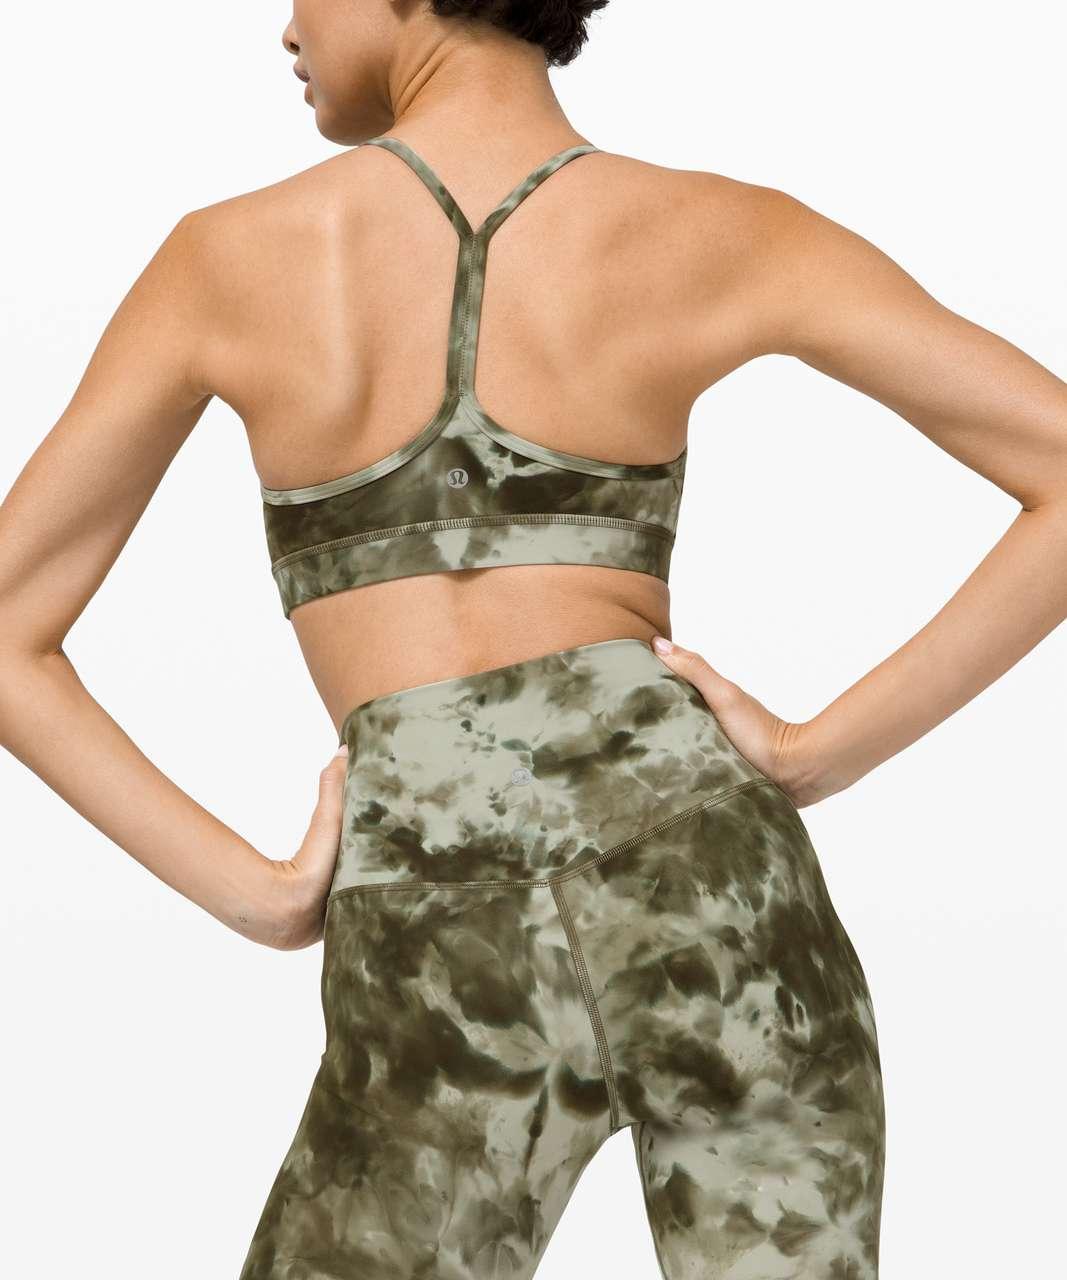 "Lululemon Align Short 8"" *Diamond Dye - Diamond Dye Light Sage Army Green Dark Olive"